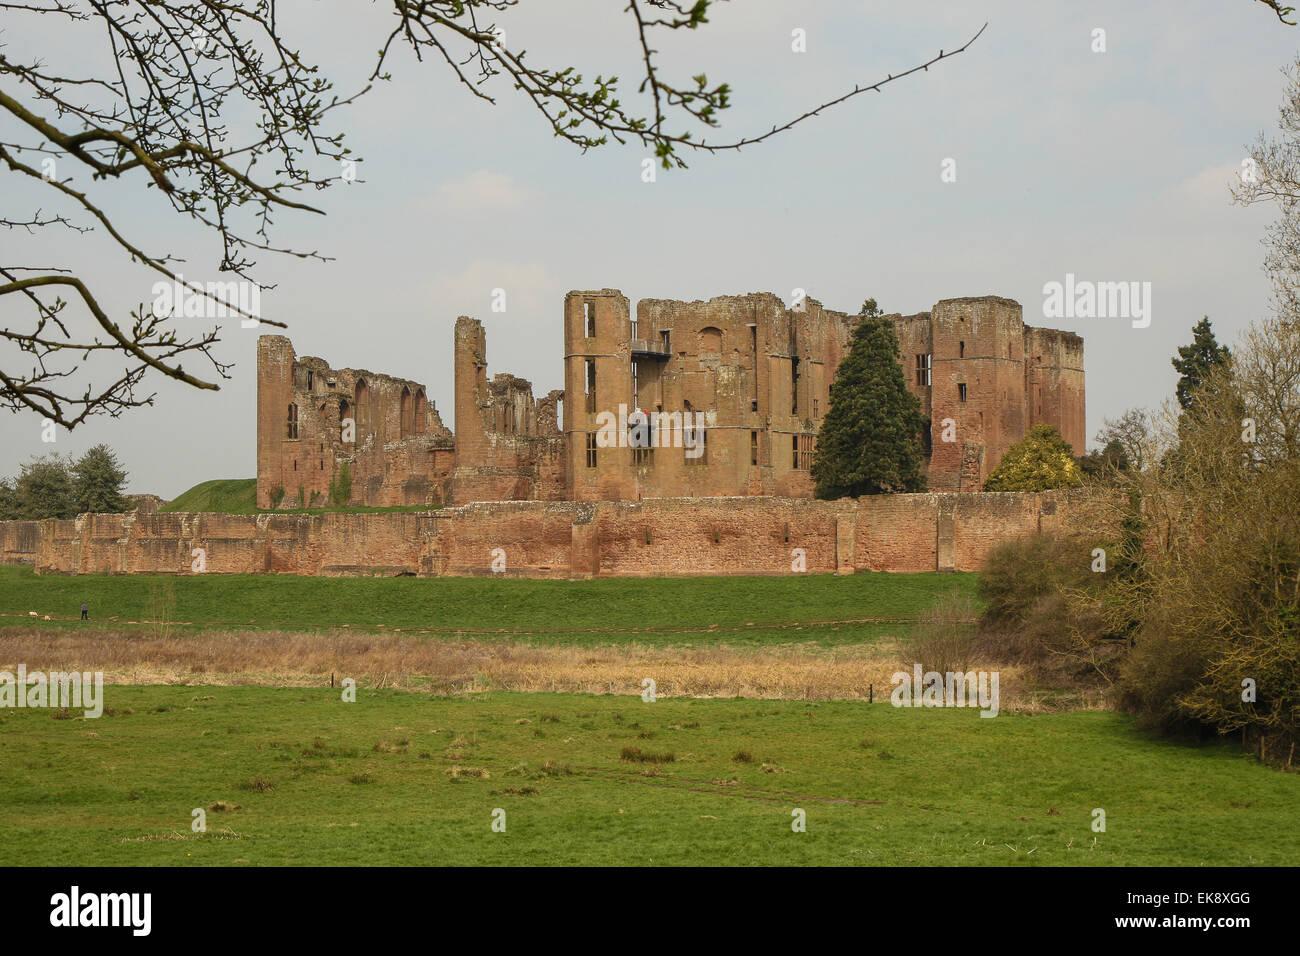 Kenilworth Castle, Warwickshire in England. - Stock Image